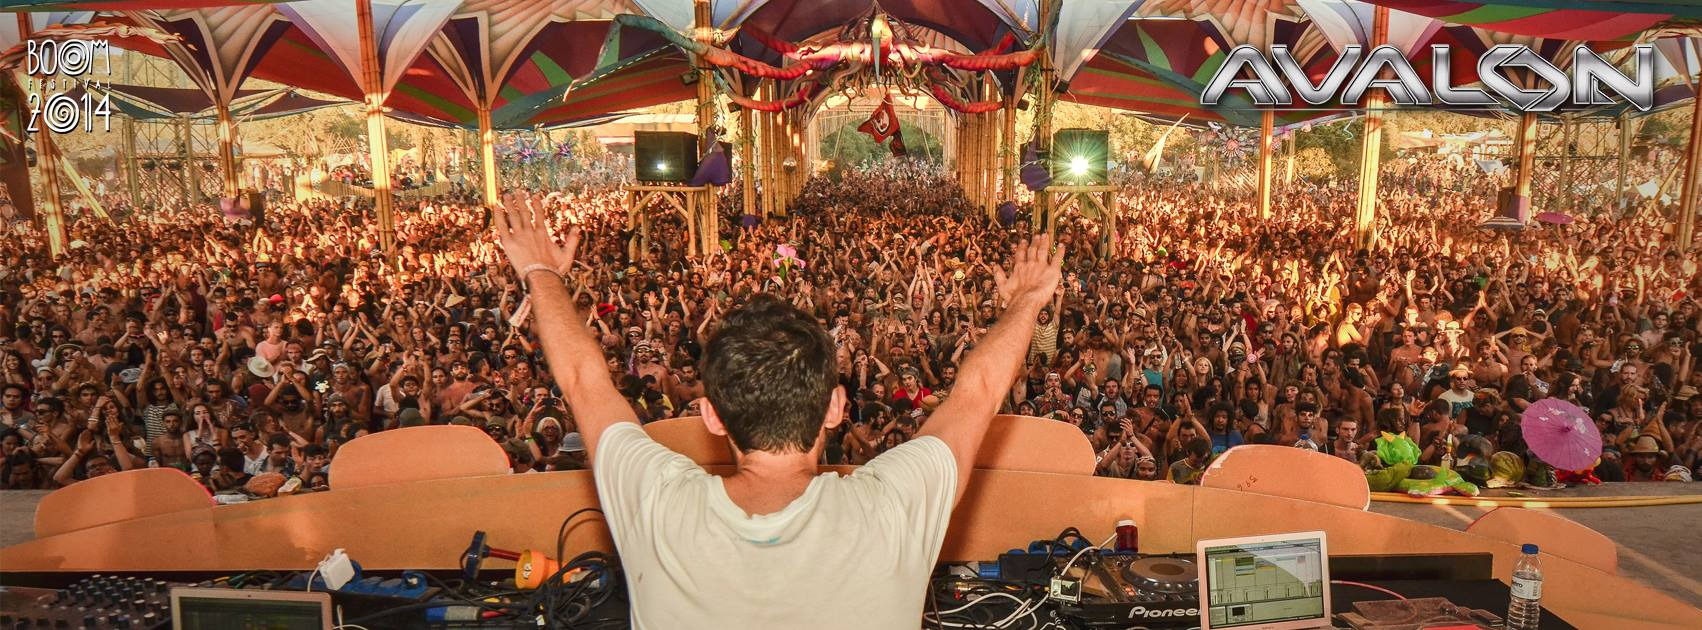 Avalon: Poznati Psy Trance producent i DJ iz Londona stiže u klub The Tube! | Beograd 2015